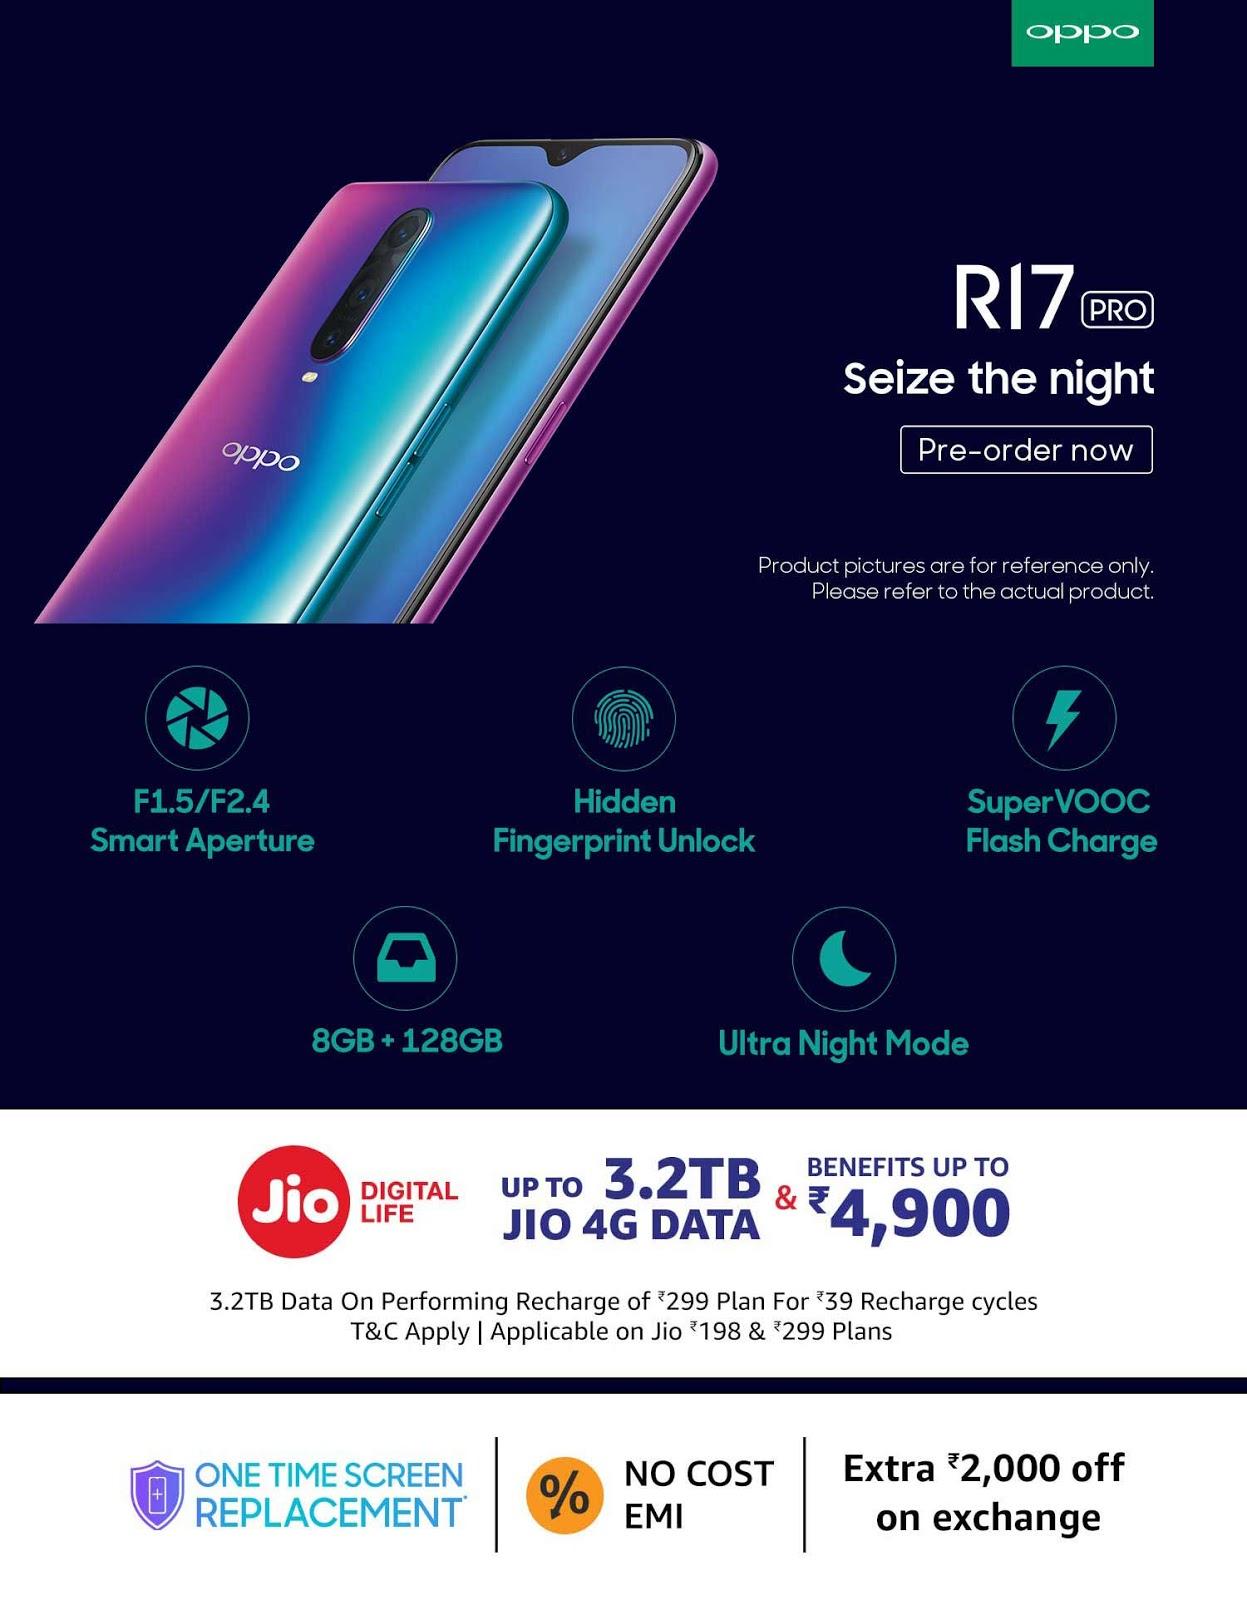 Pre-order ] Oppo R17 Pro in Stock on Amazon India | Price